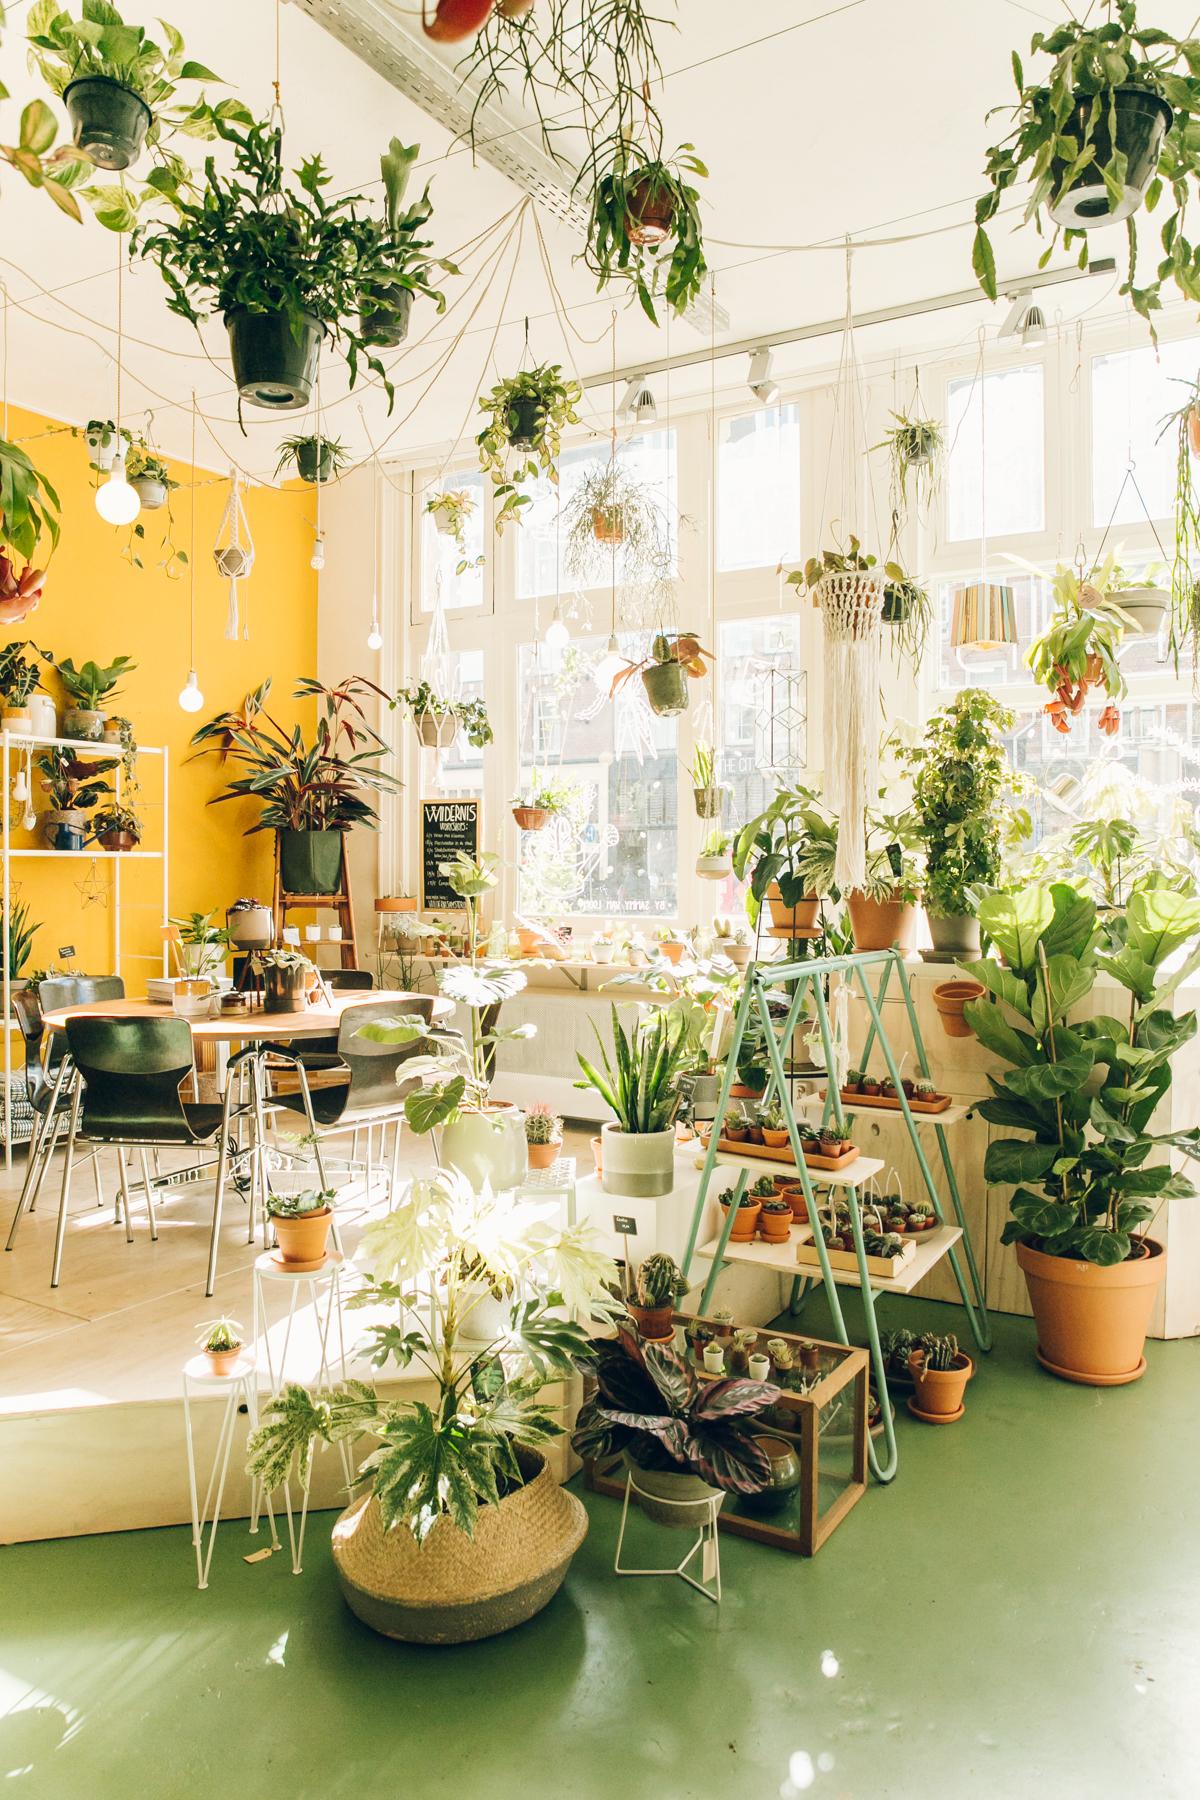 Inside Wildernis - a plant shop in Amsterdam.